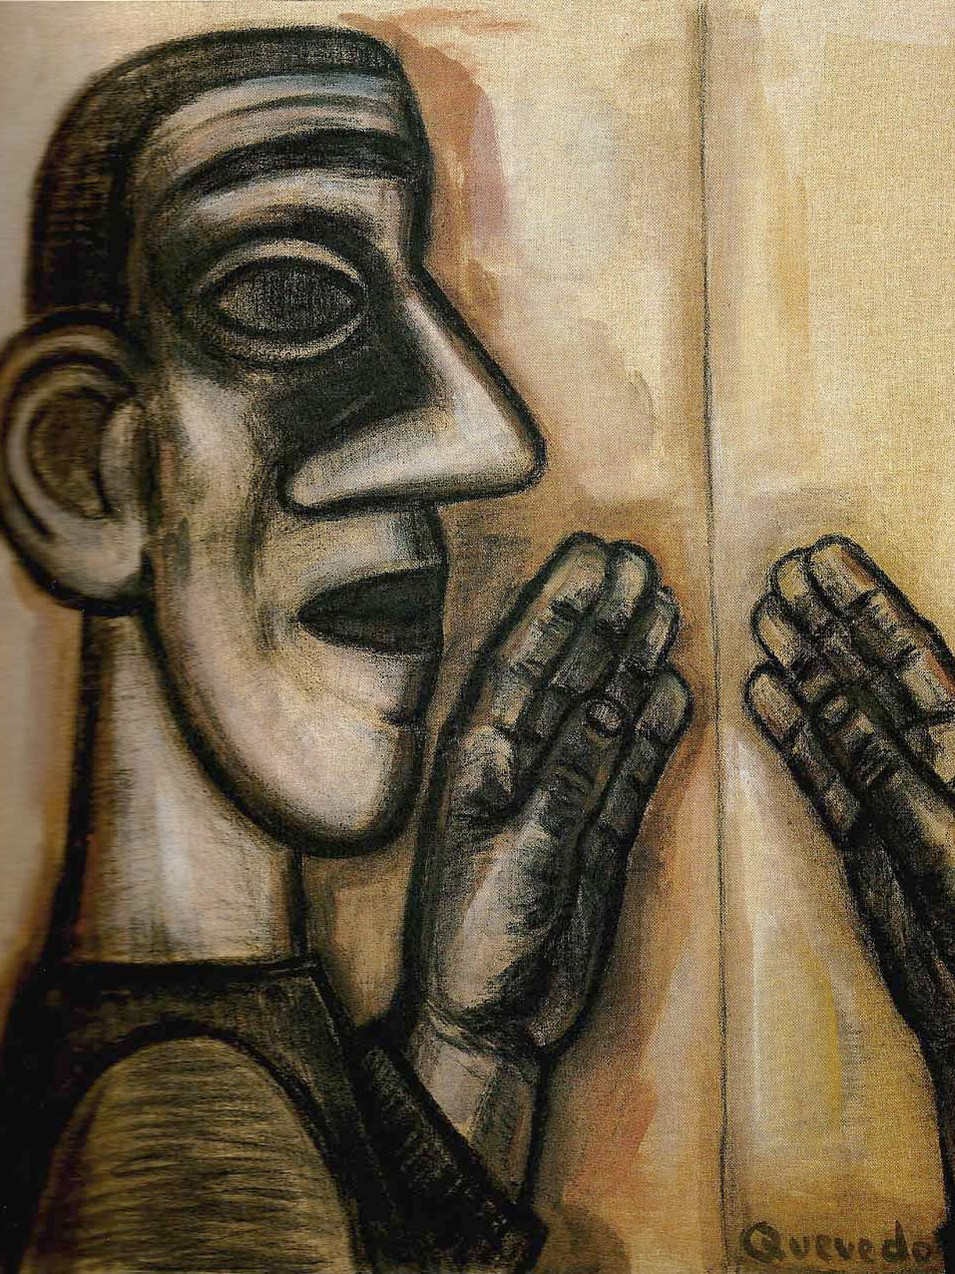 Nuria Quevedo | Kopf-Hand | 1993 | Kohle, Tempera auf Leinwand| 120 x 110 cm